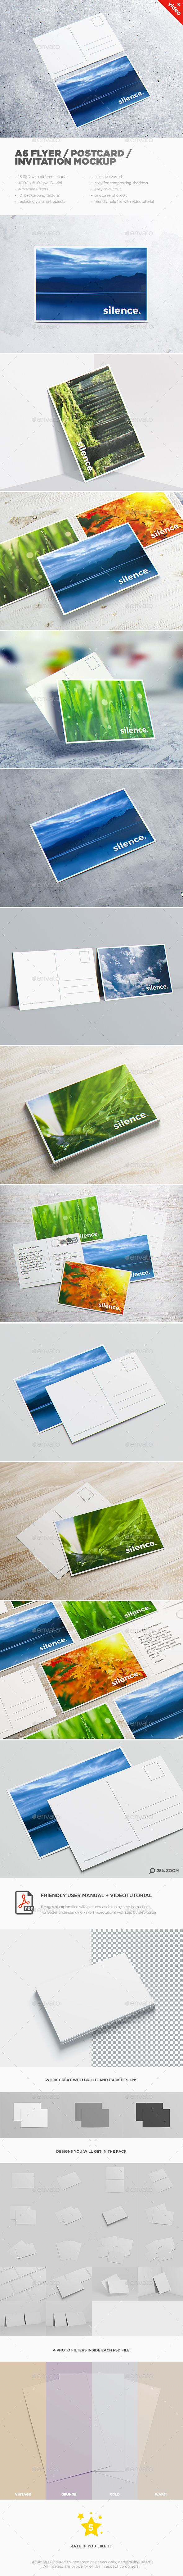 A6 Flyer / Postcard / Invitation MockUp